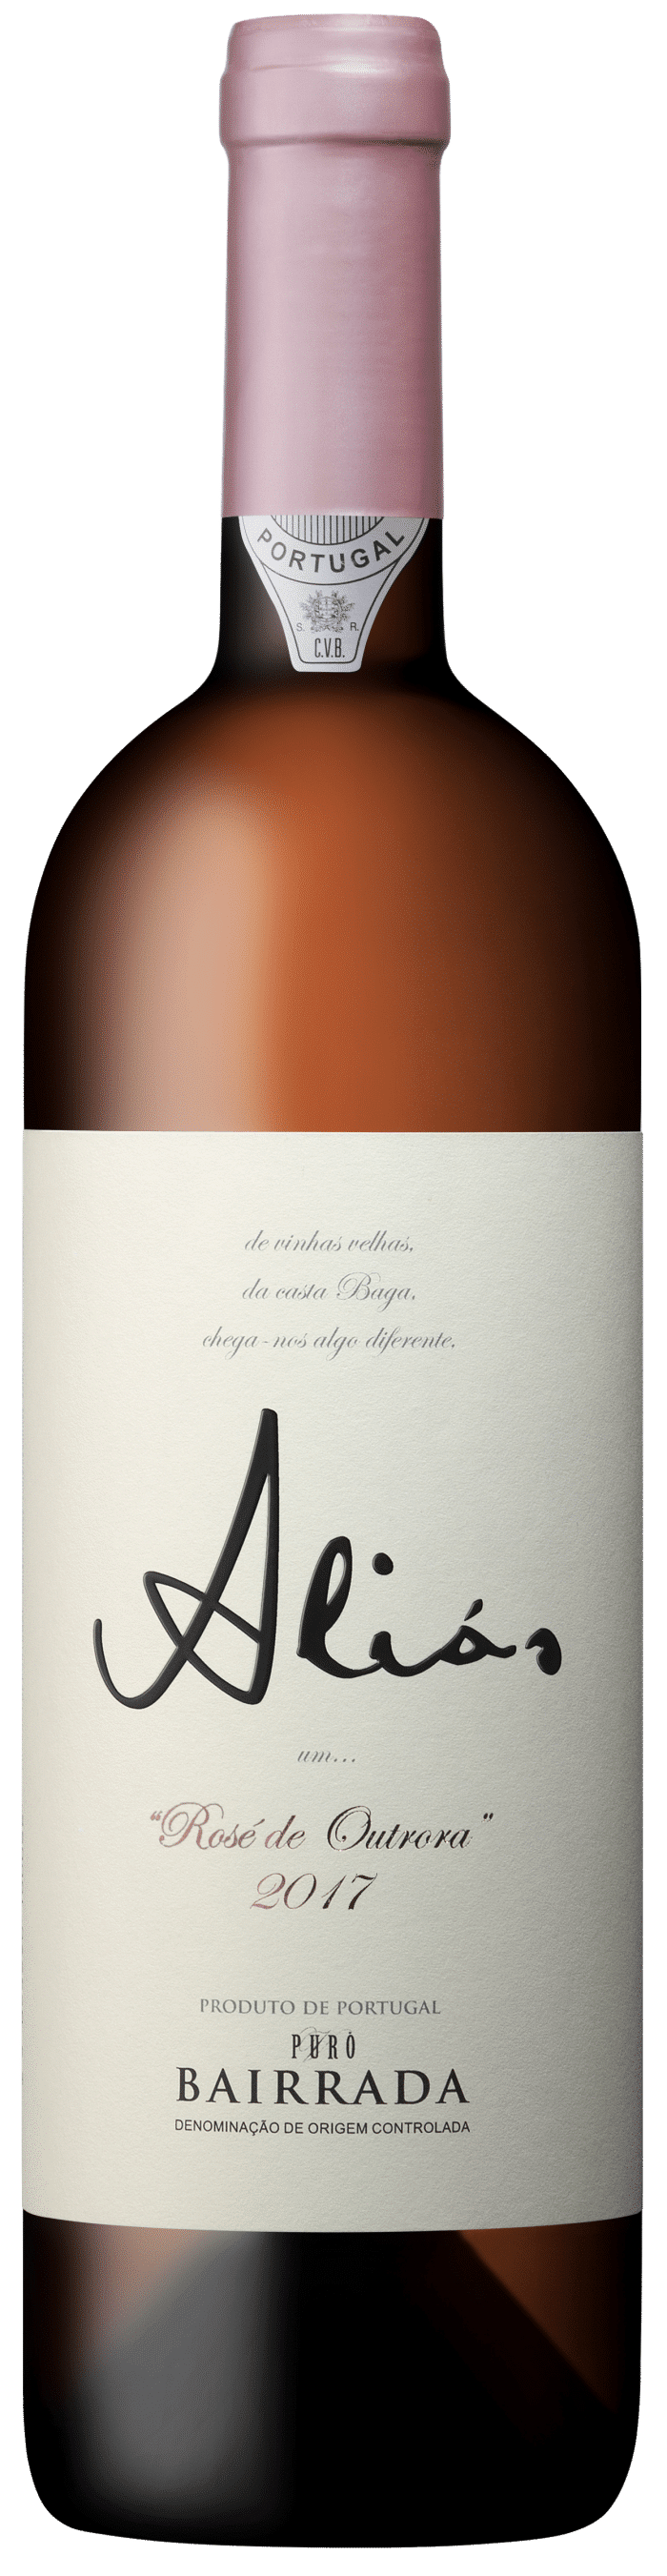 Outrora Alias rosé   Portugal   gemaakt van de druif: Baga